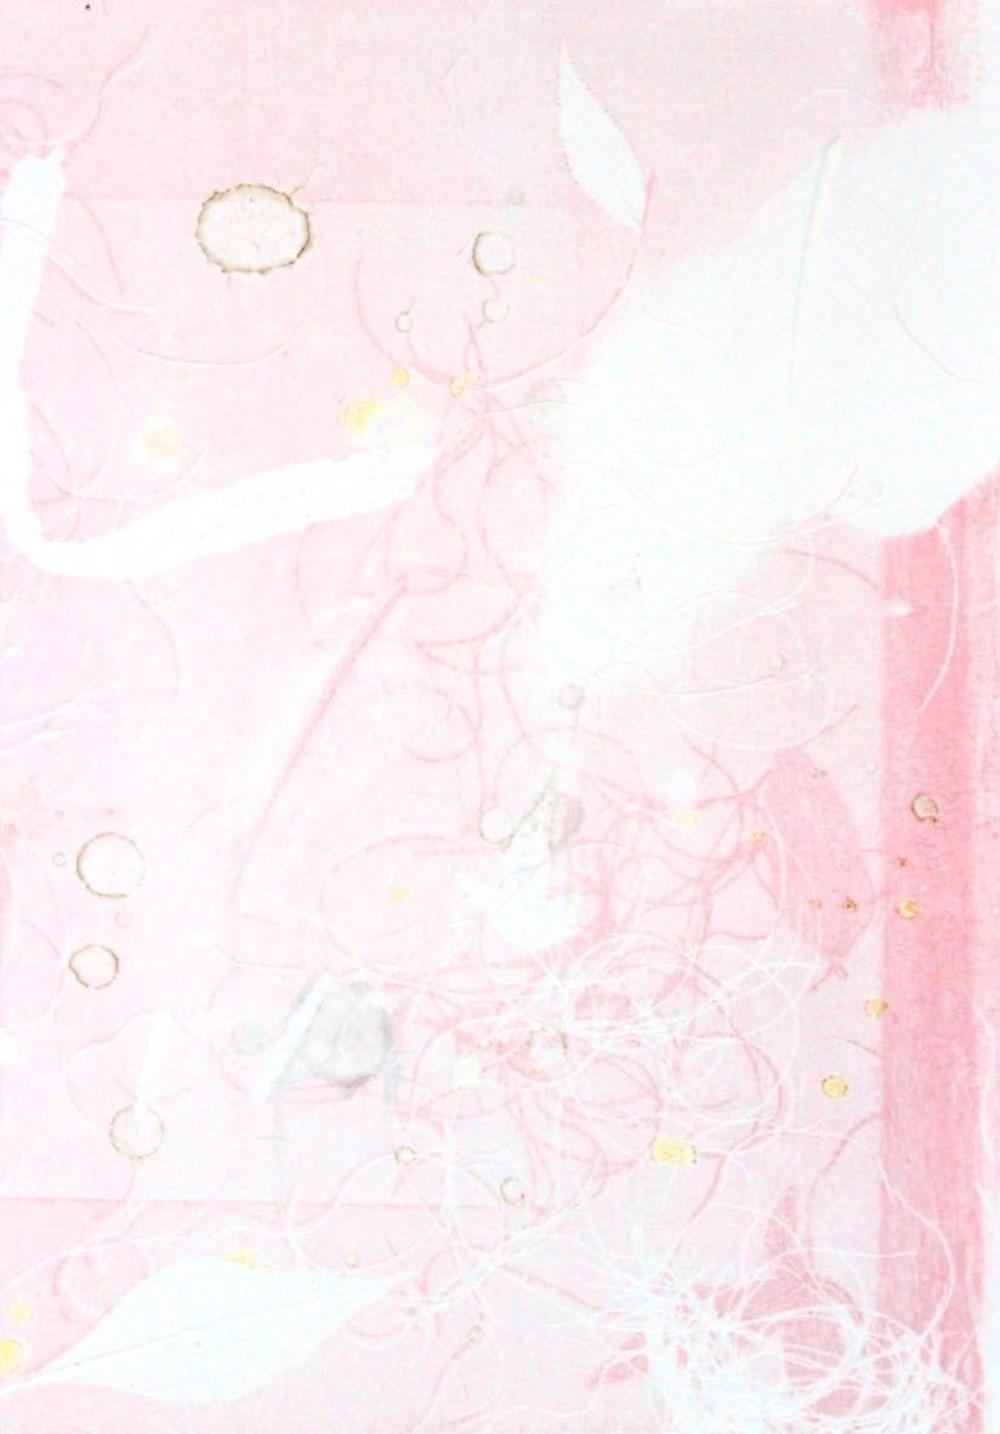 Life on Venus III | The Organic, Timed Auction - Lot 15, Ema Mano Epps, Chronology on Venus 3